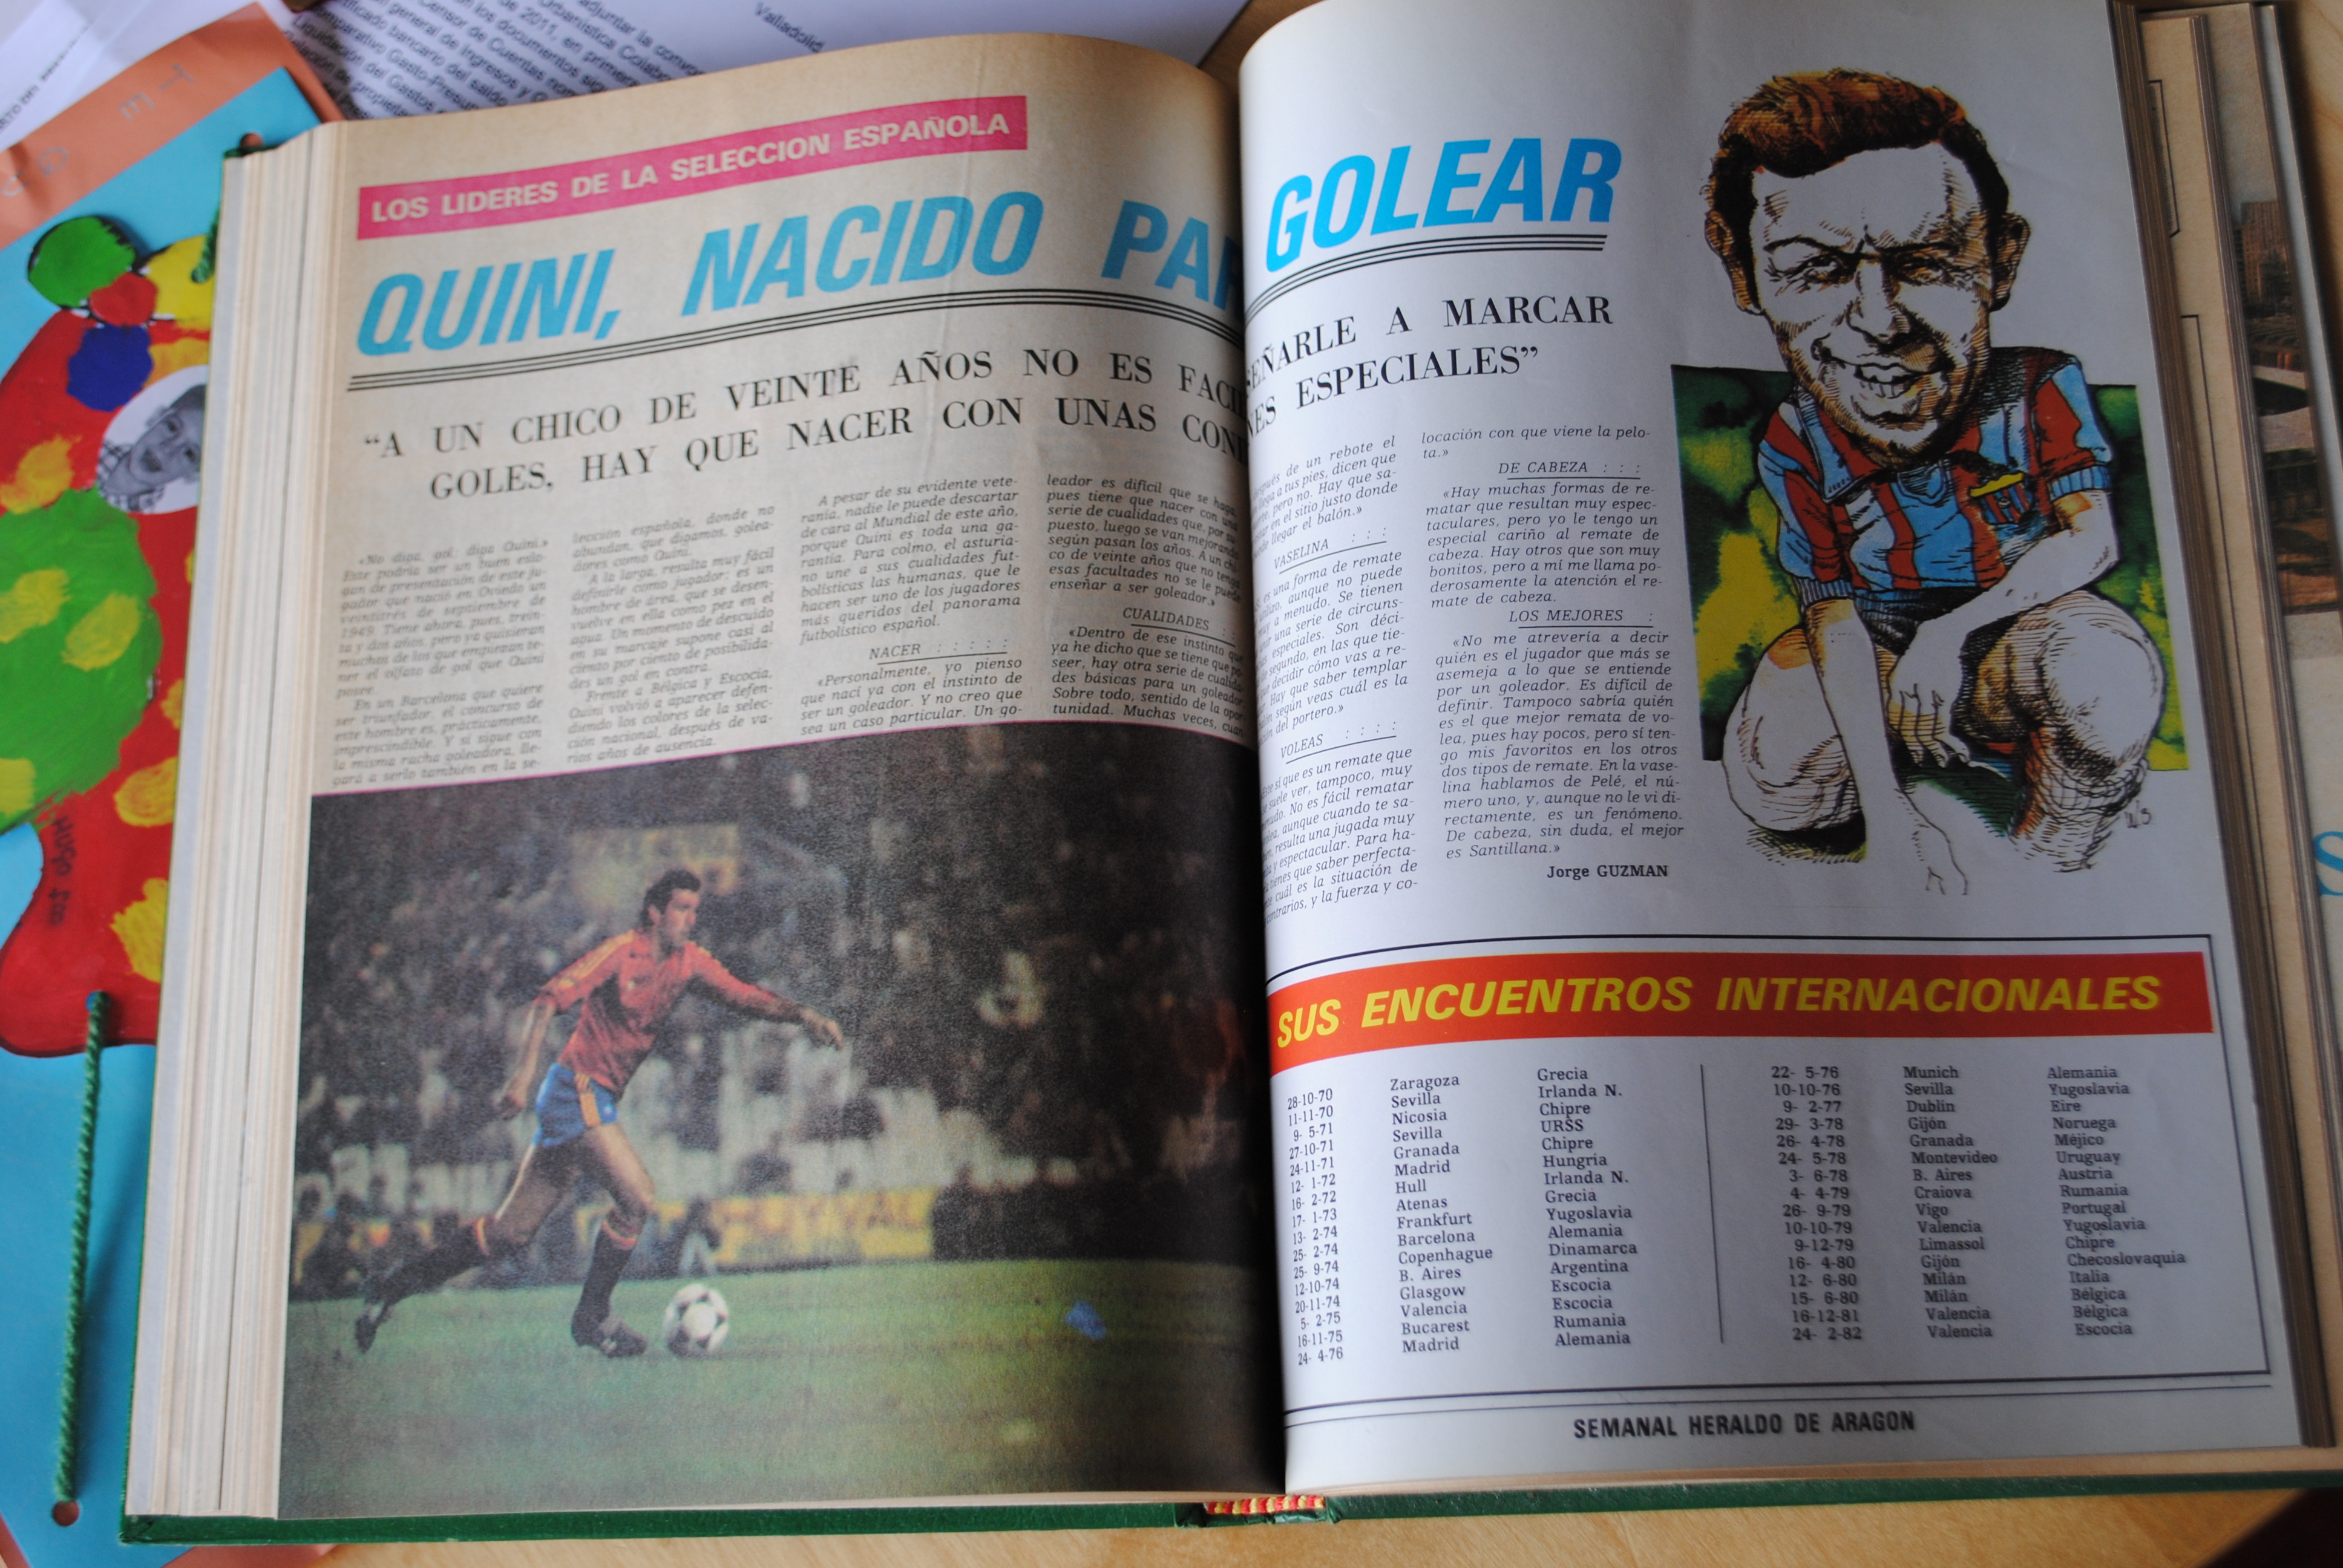 Coleccionismo deportivo: CAMPEONATO MUNDIAL DE FUTBOL 1982. HERALDO DE ARAGON. COMPLETO!!!!!!!!!! MUNDIAL 82 - Foto 6 - 27249749